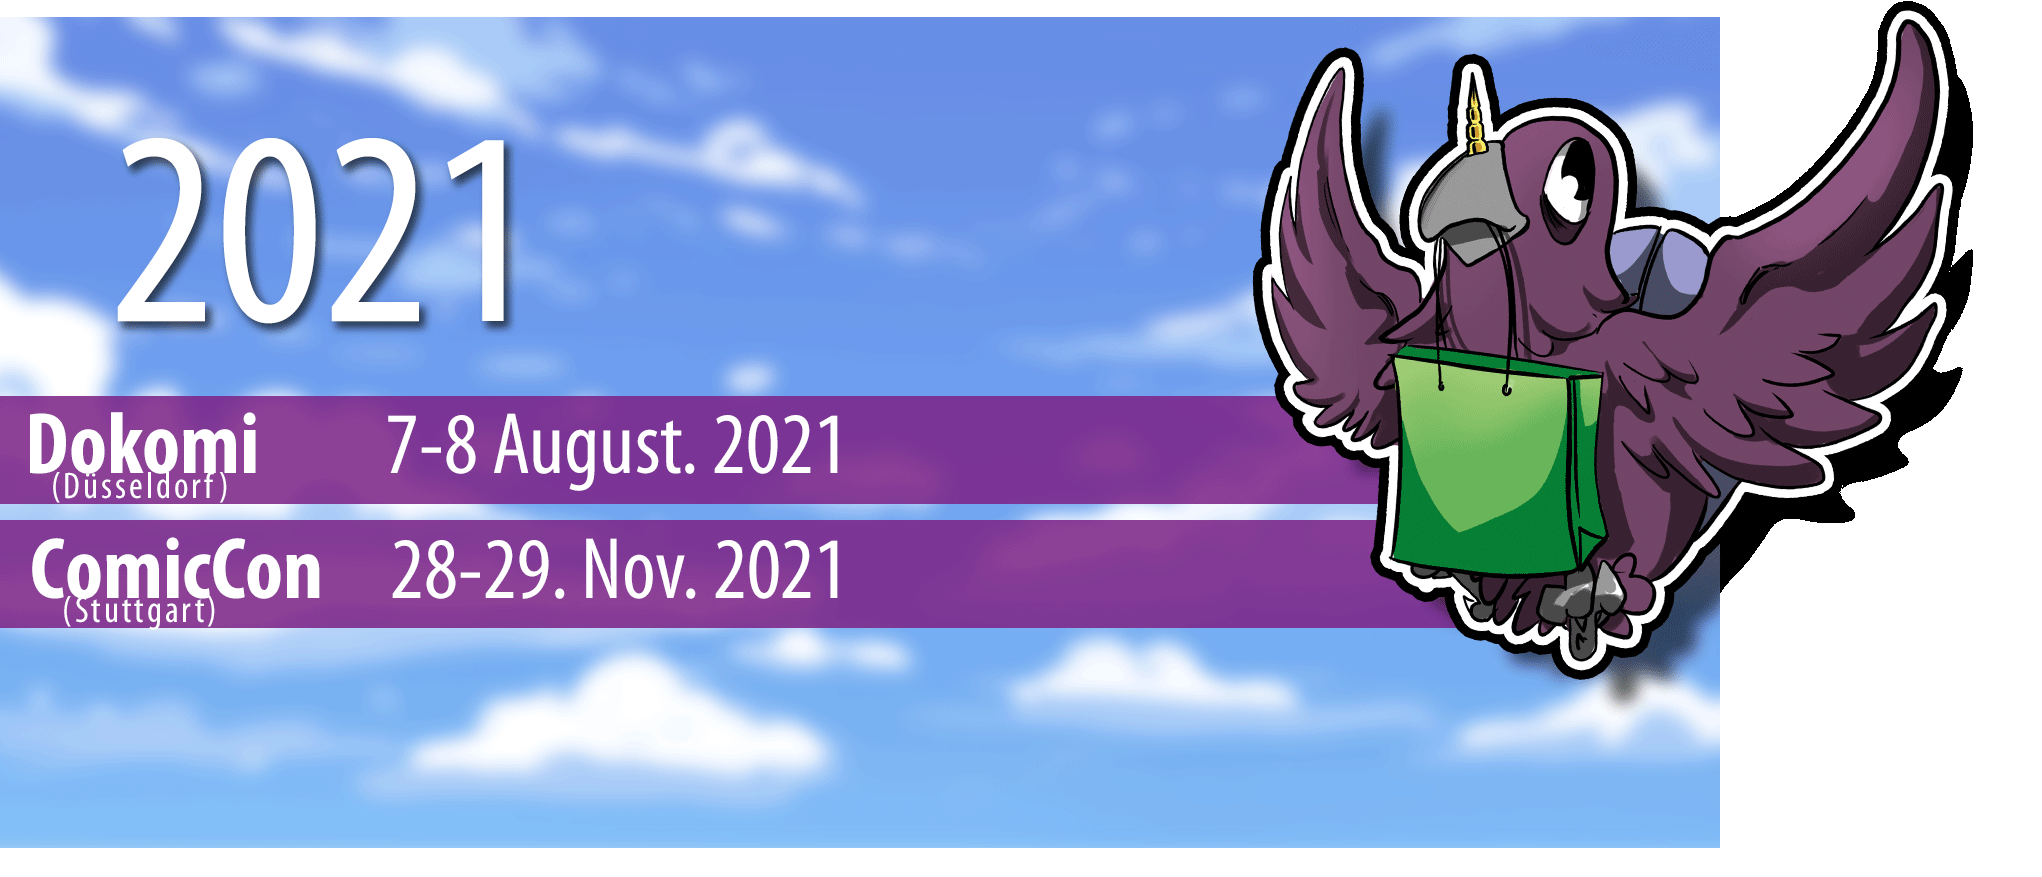 Messetermine-2021-JUN